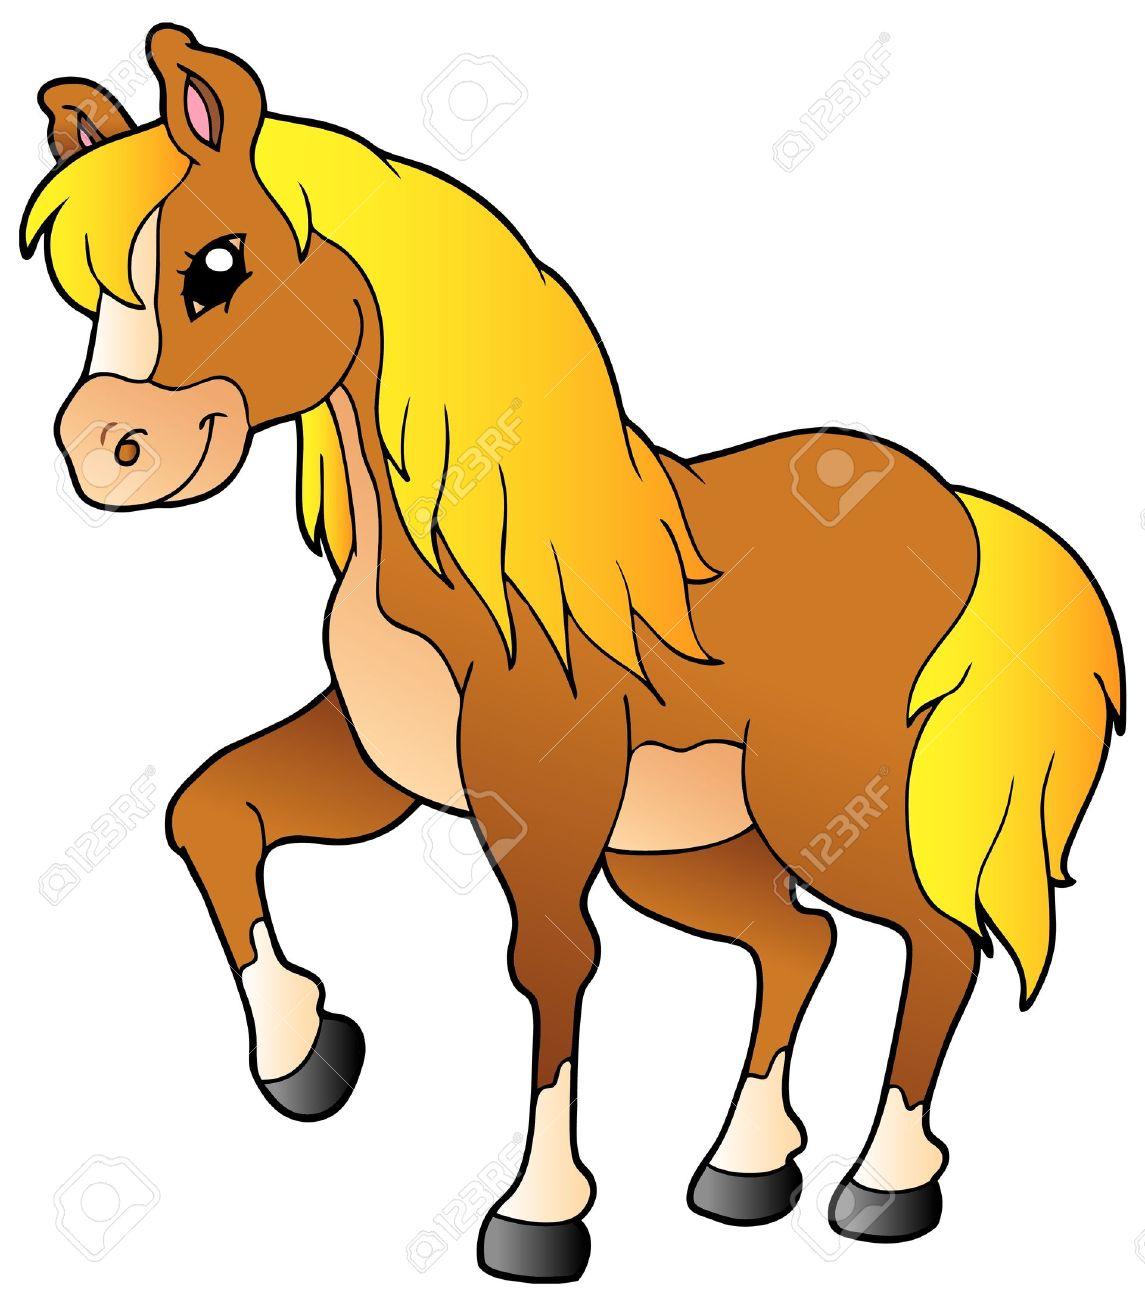 Clip Art Clipart Horse cartoon walking horse royalty free cliparts vectors and stock vector 9133397